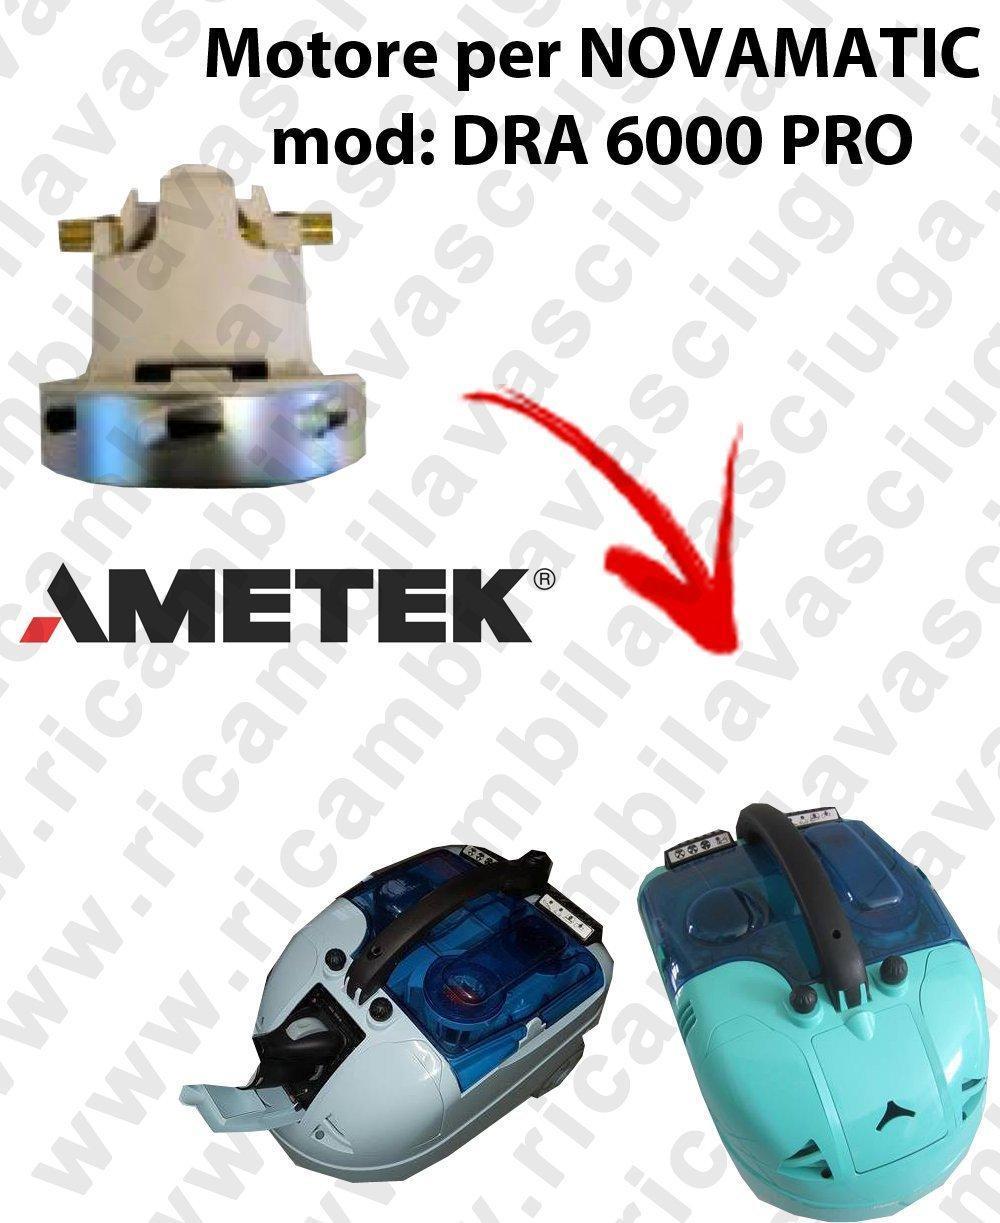 DRA 6000 PRO Motore de aspiración AMETEK para aspiradora NOVAMATIC